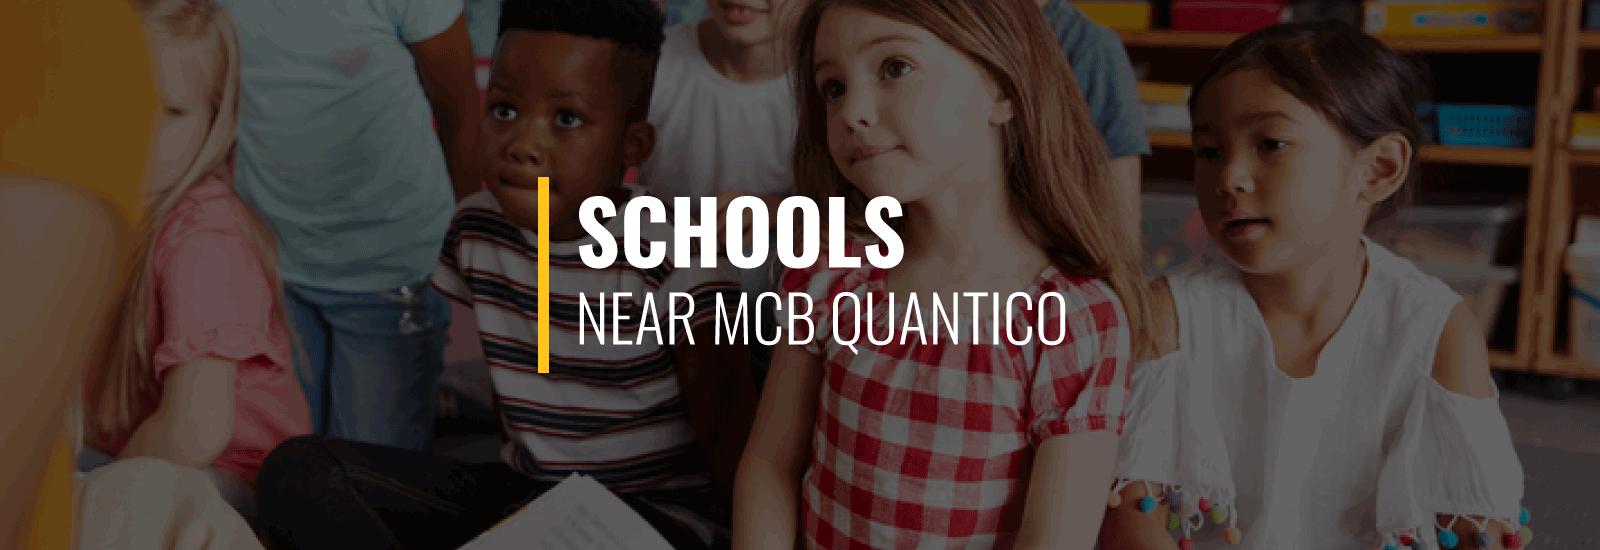 Schools Near MCB Quantico